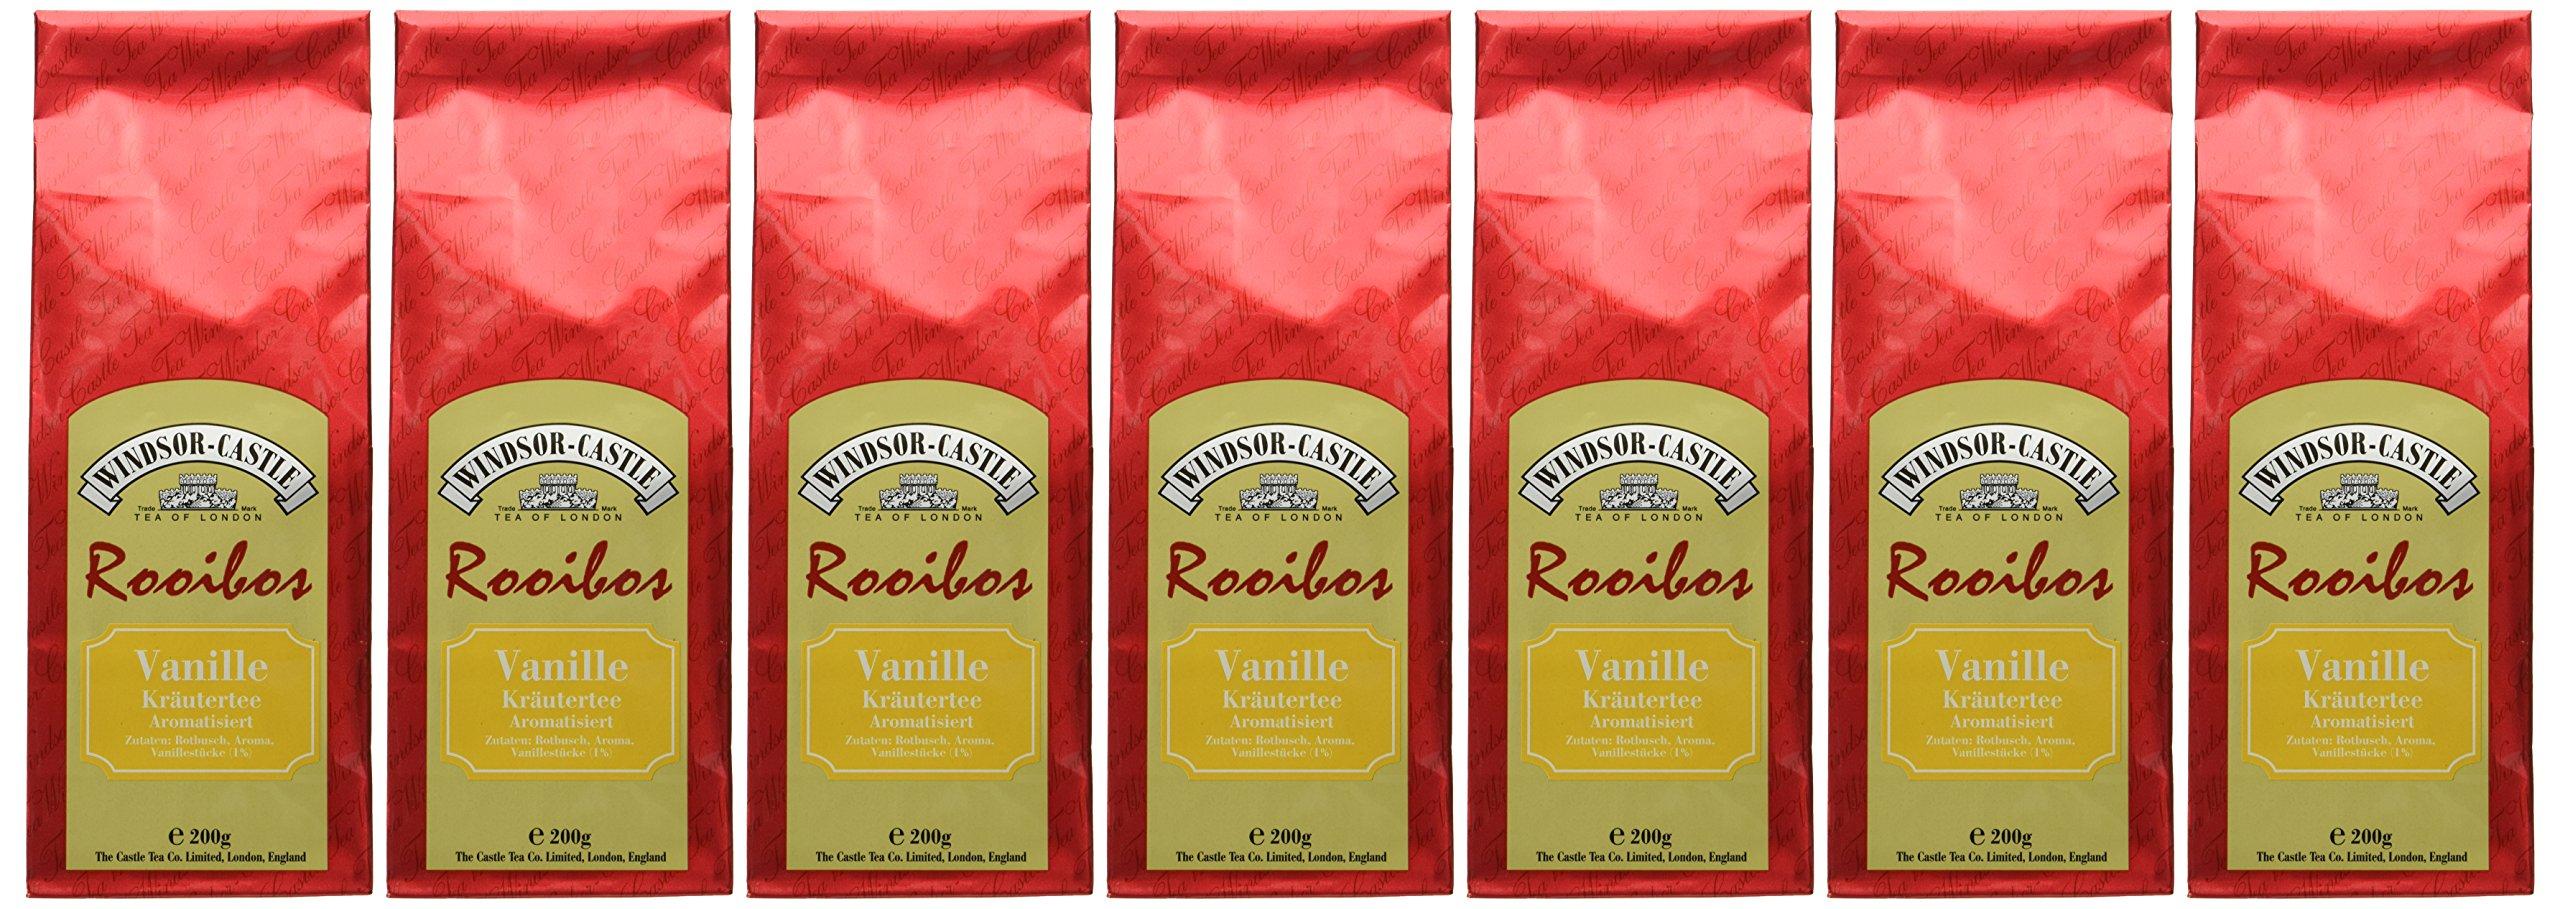 Windsor-Castle-Rooibos-Vanille-7er-Pack-7-x-237-g